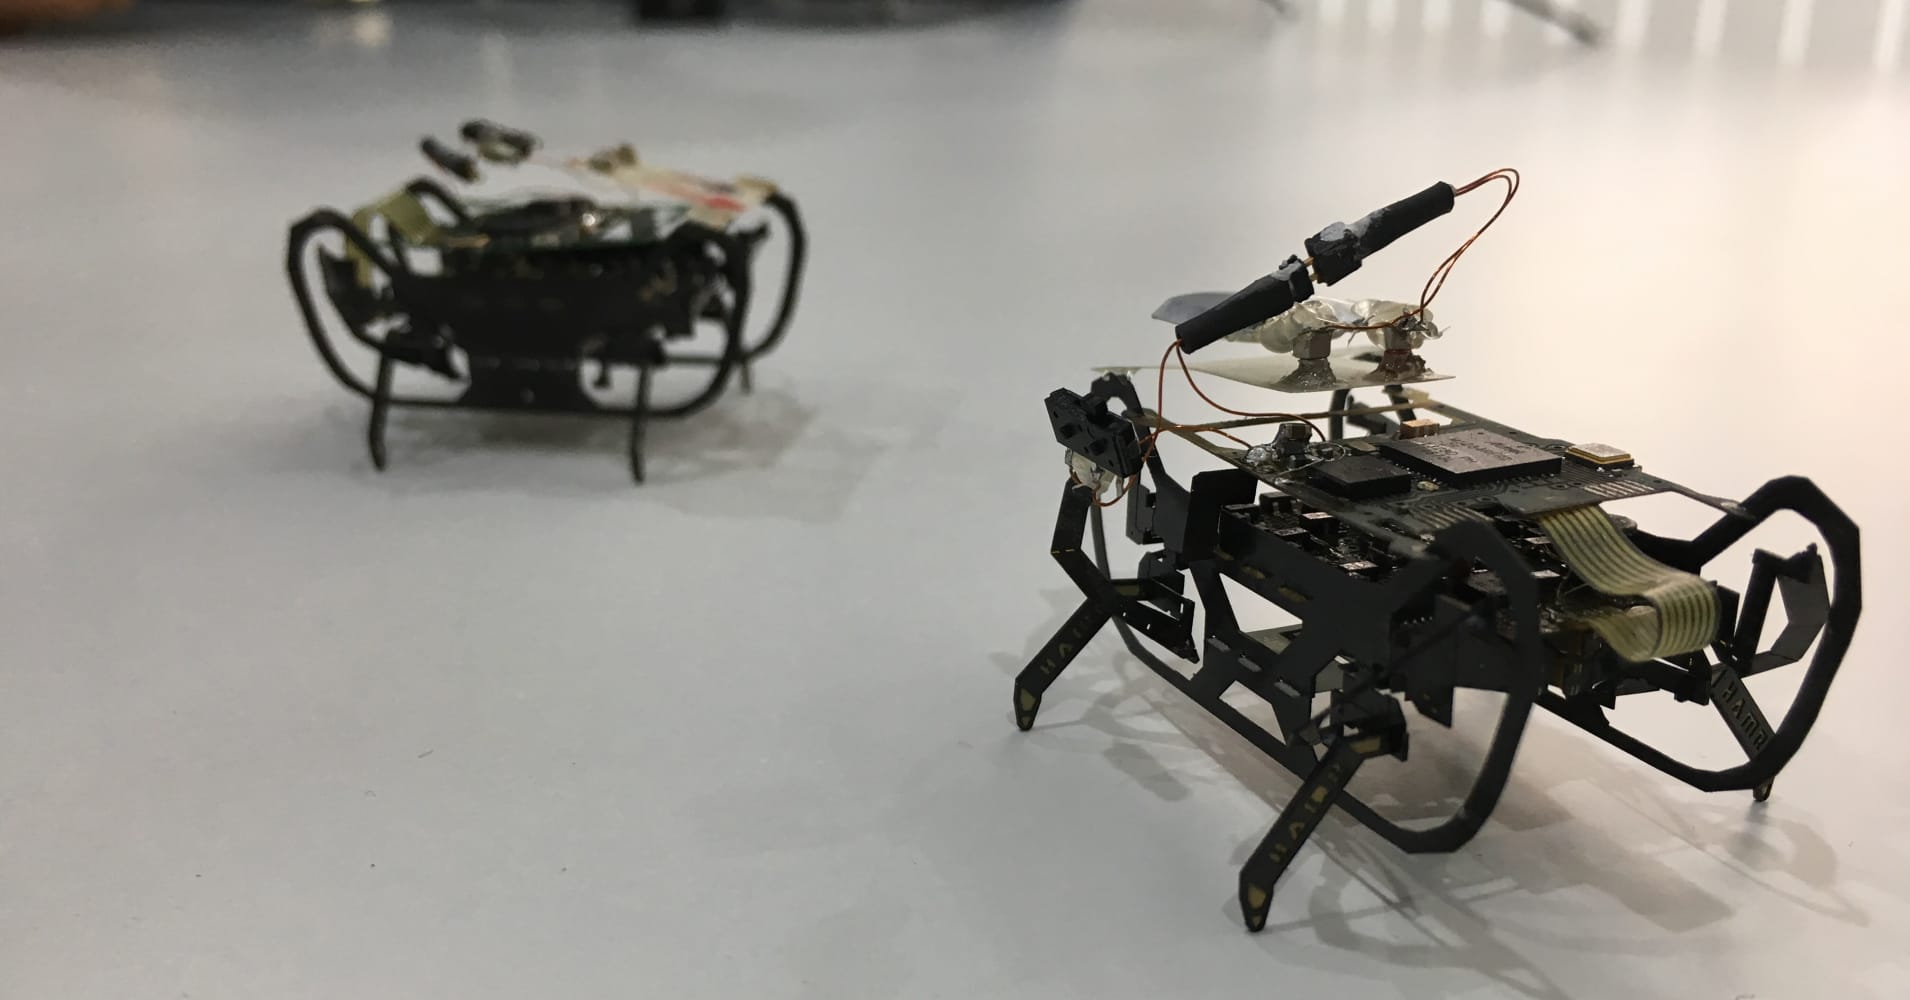 Tiny prototype robots developed by Harvard University using the cockroach as inspiration.